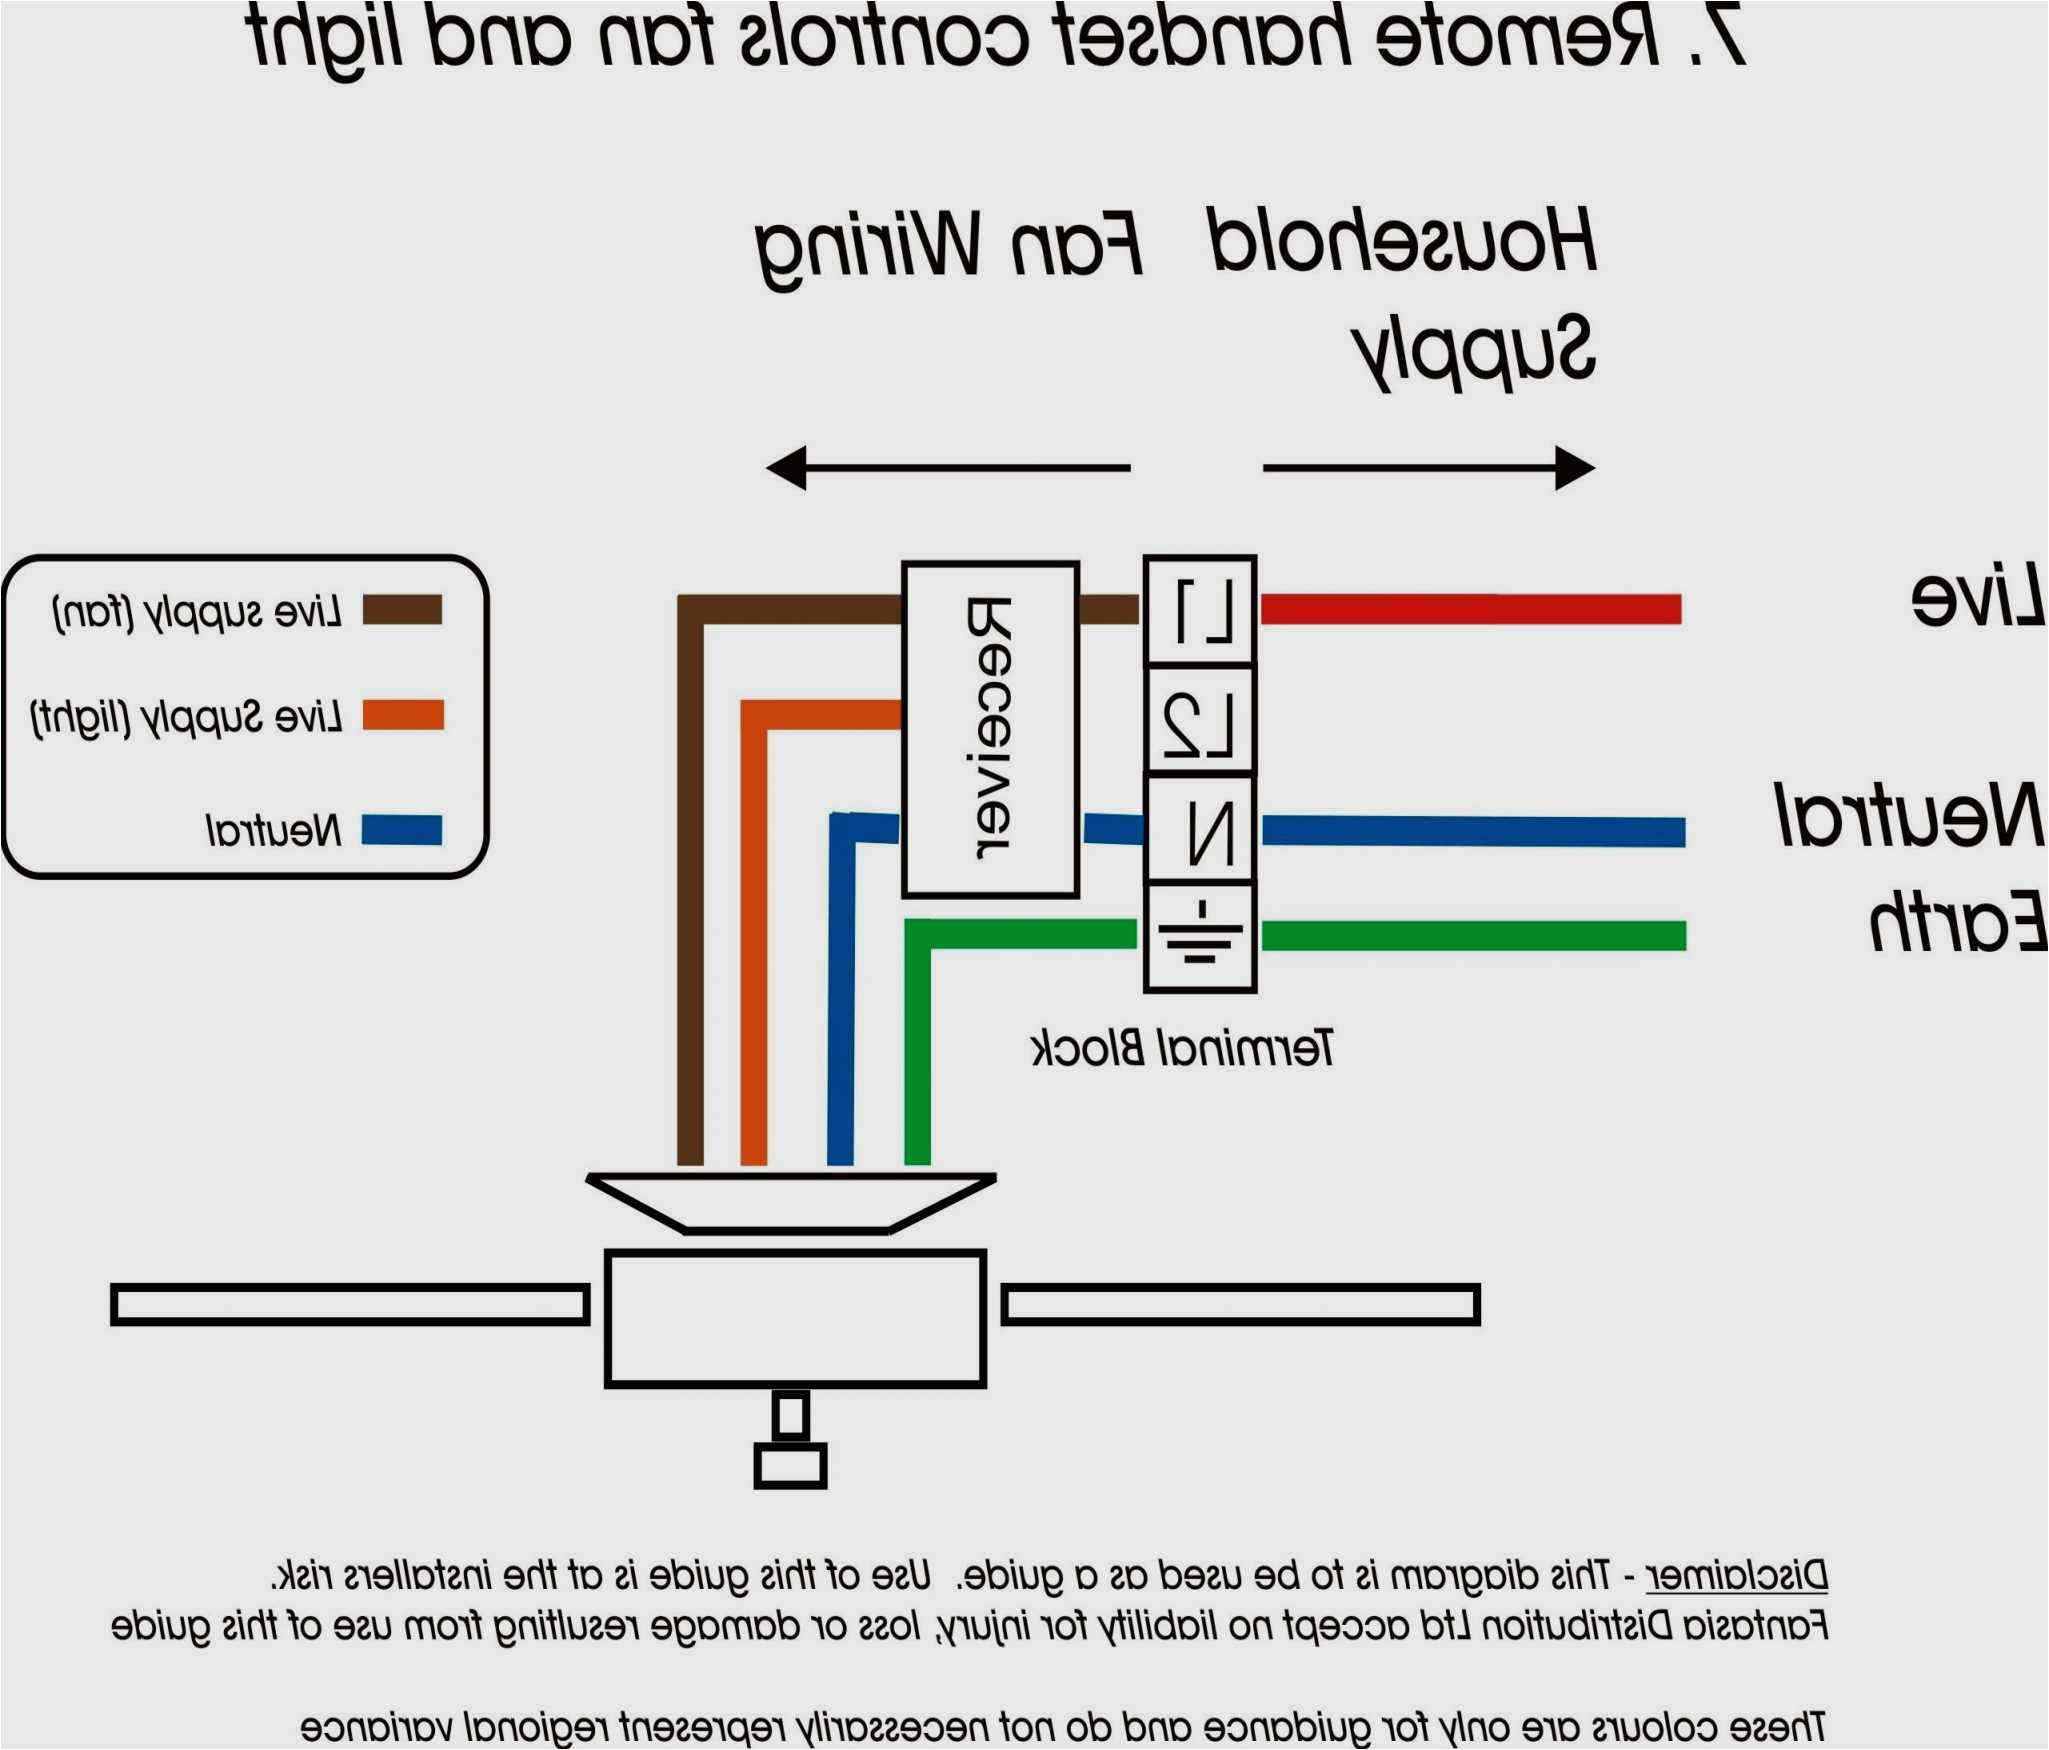 leviton decora 3 way switch wiring diagram leviton 3 rocker switch leviton 3 way switches wiring diagram